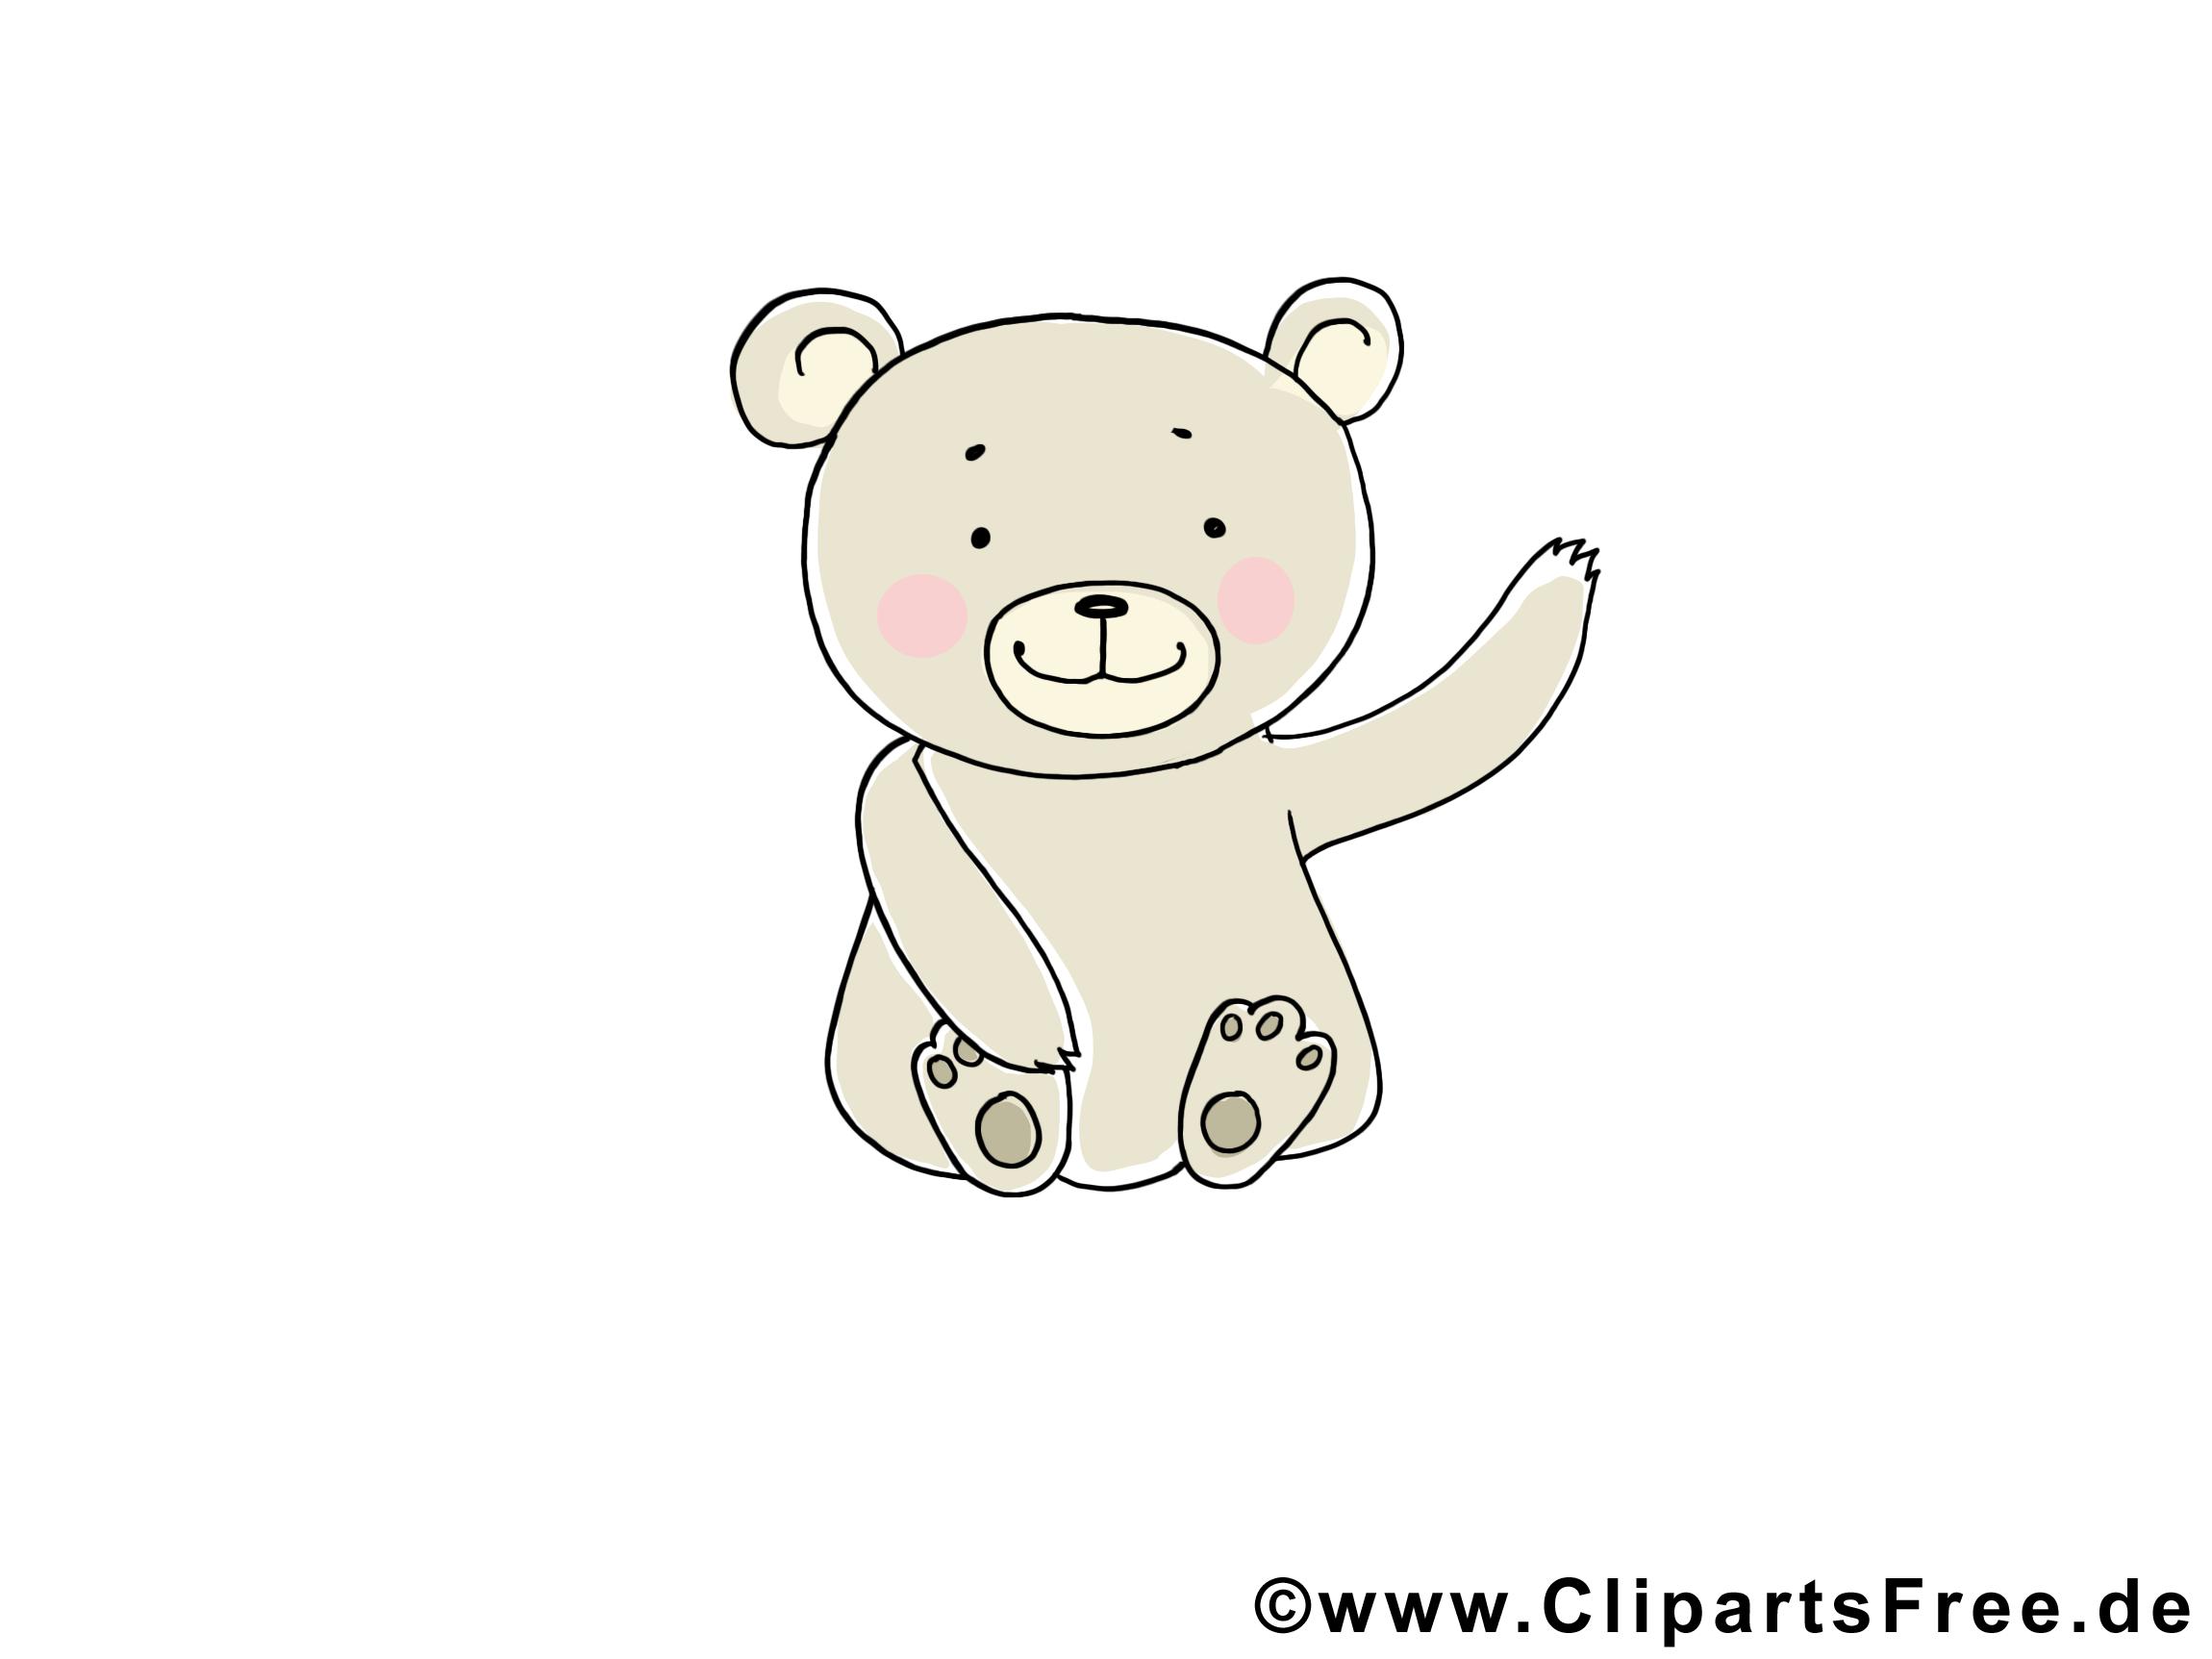 Teddybaer - Tierbilder gratis